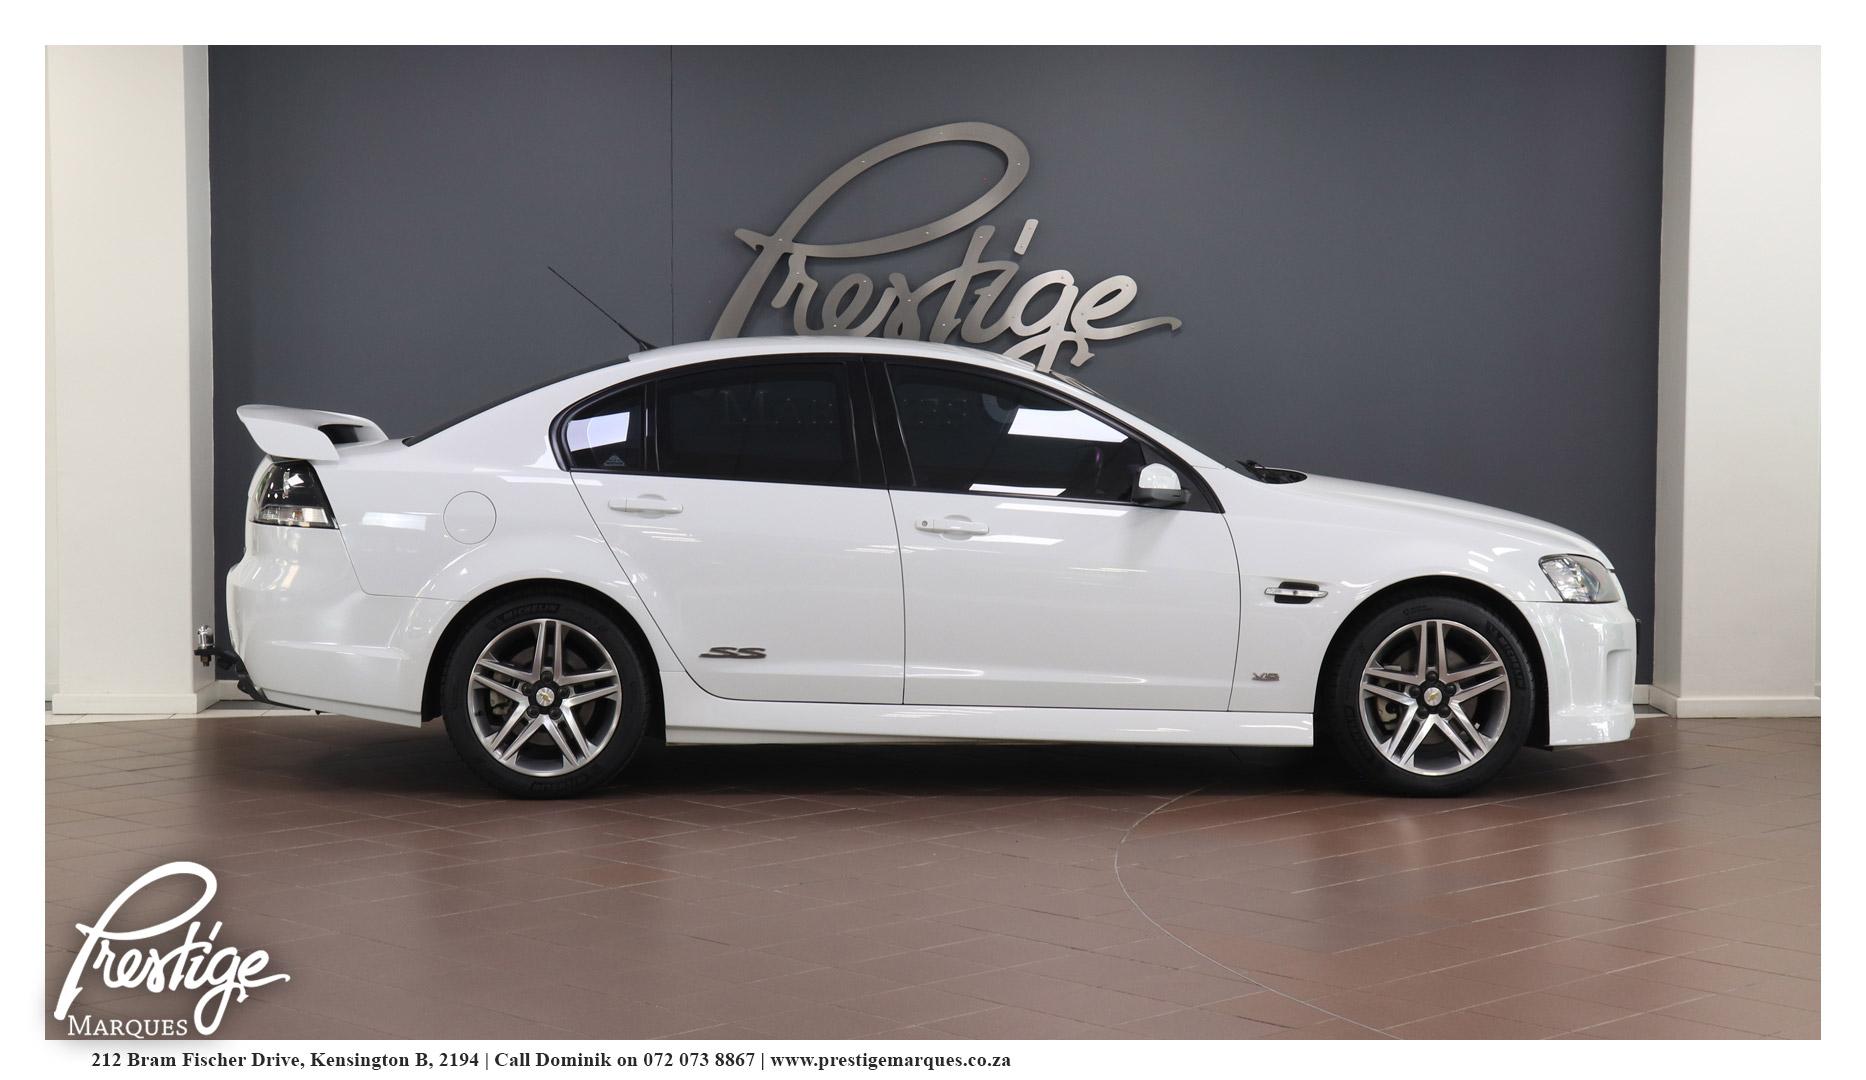 2008-Chevrolet-Lumina-SS-5.4-Manual-Prestige-Marques-Randburg-Sandton-3